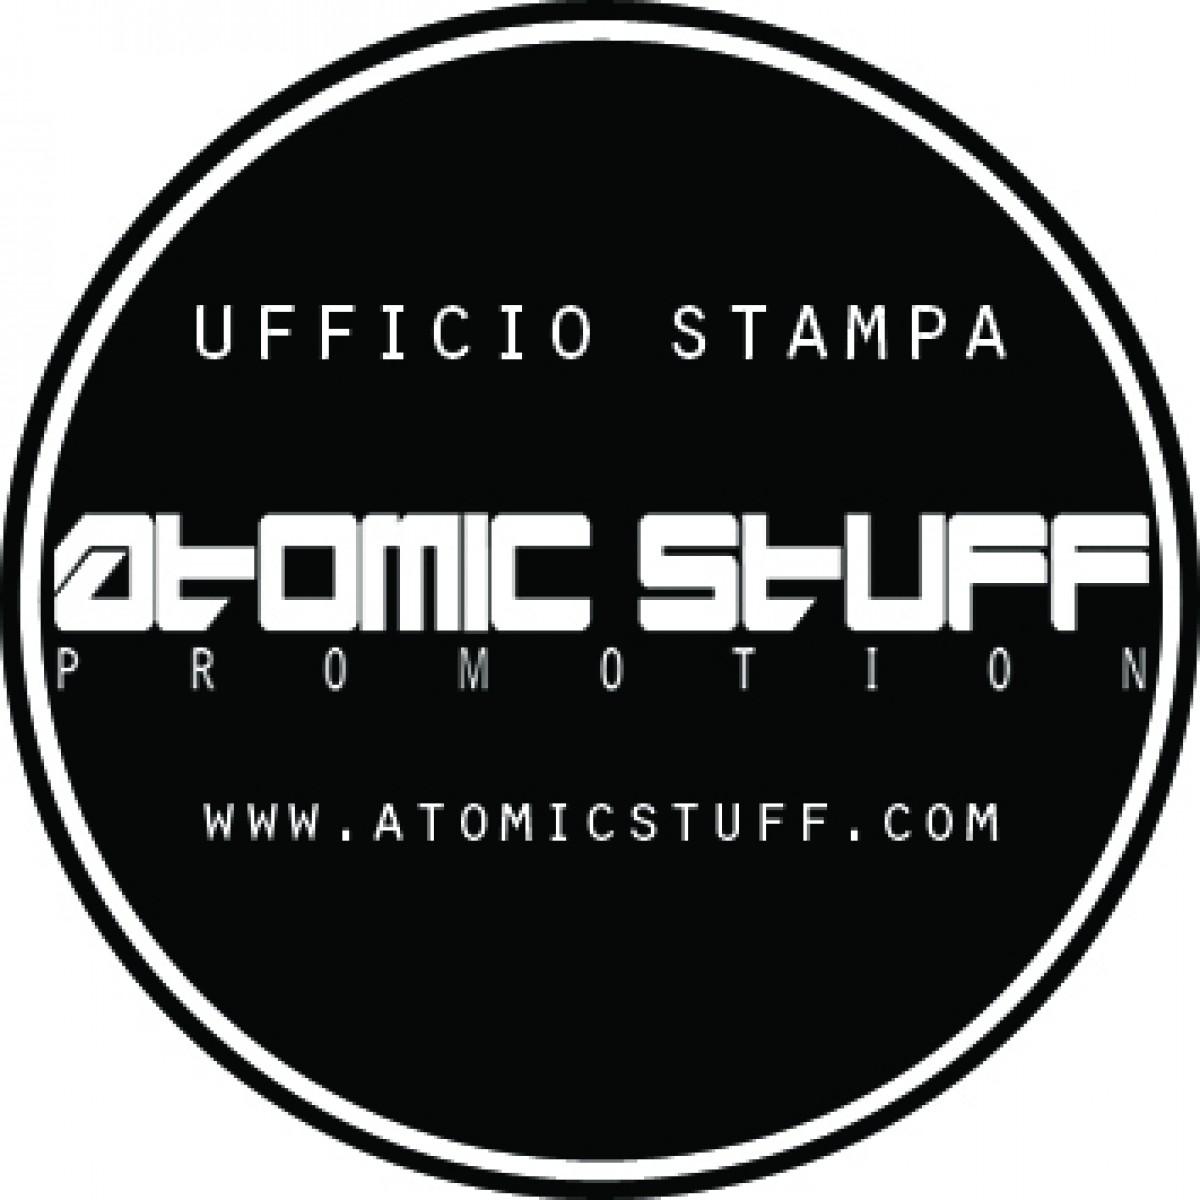 Atomic Stuff